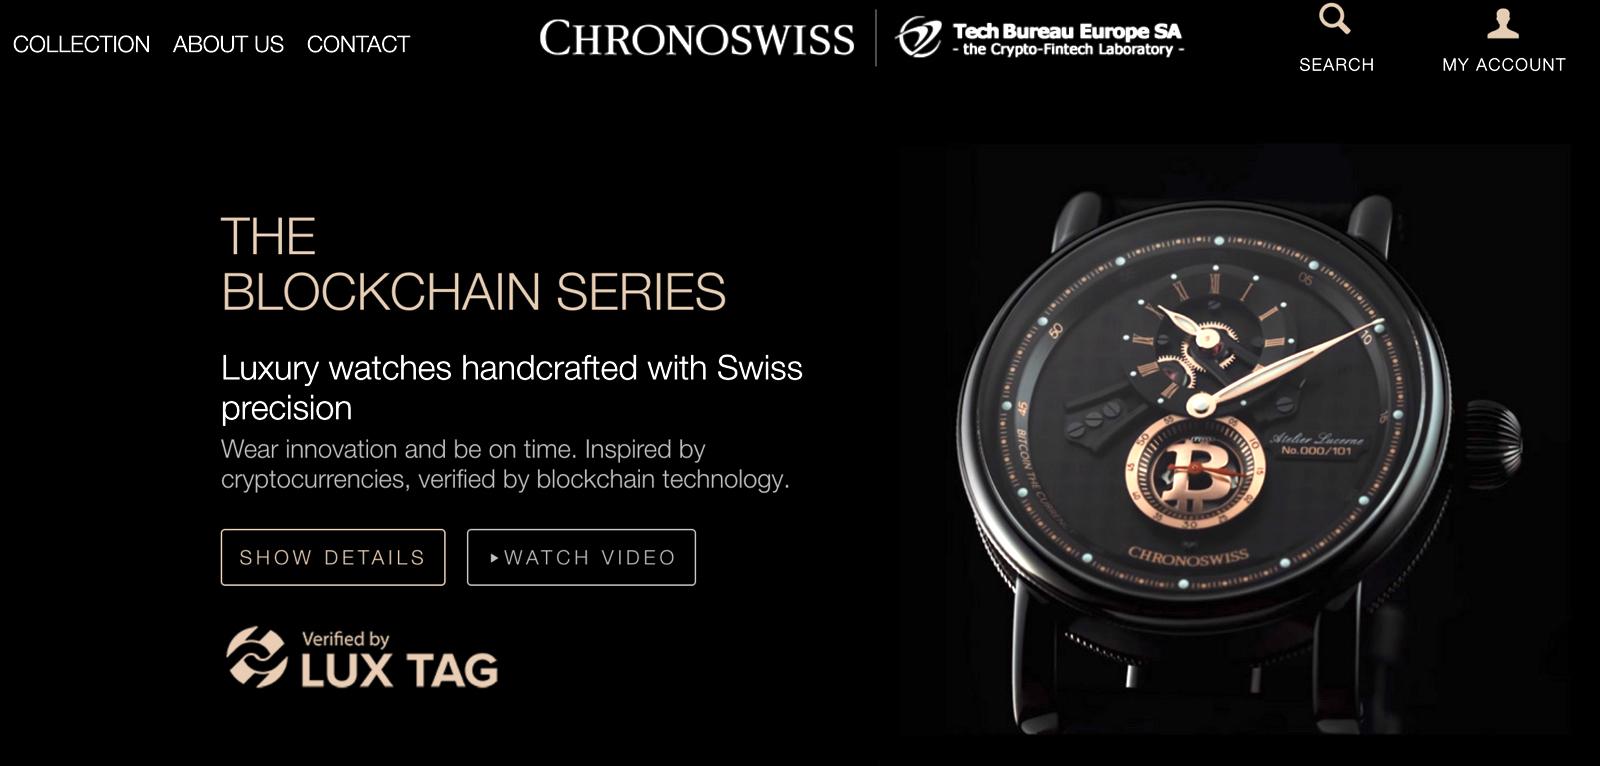 Chronoswiss Blockchain Cover